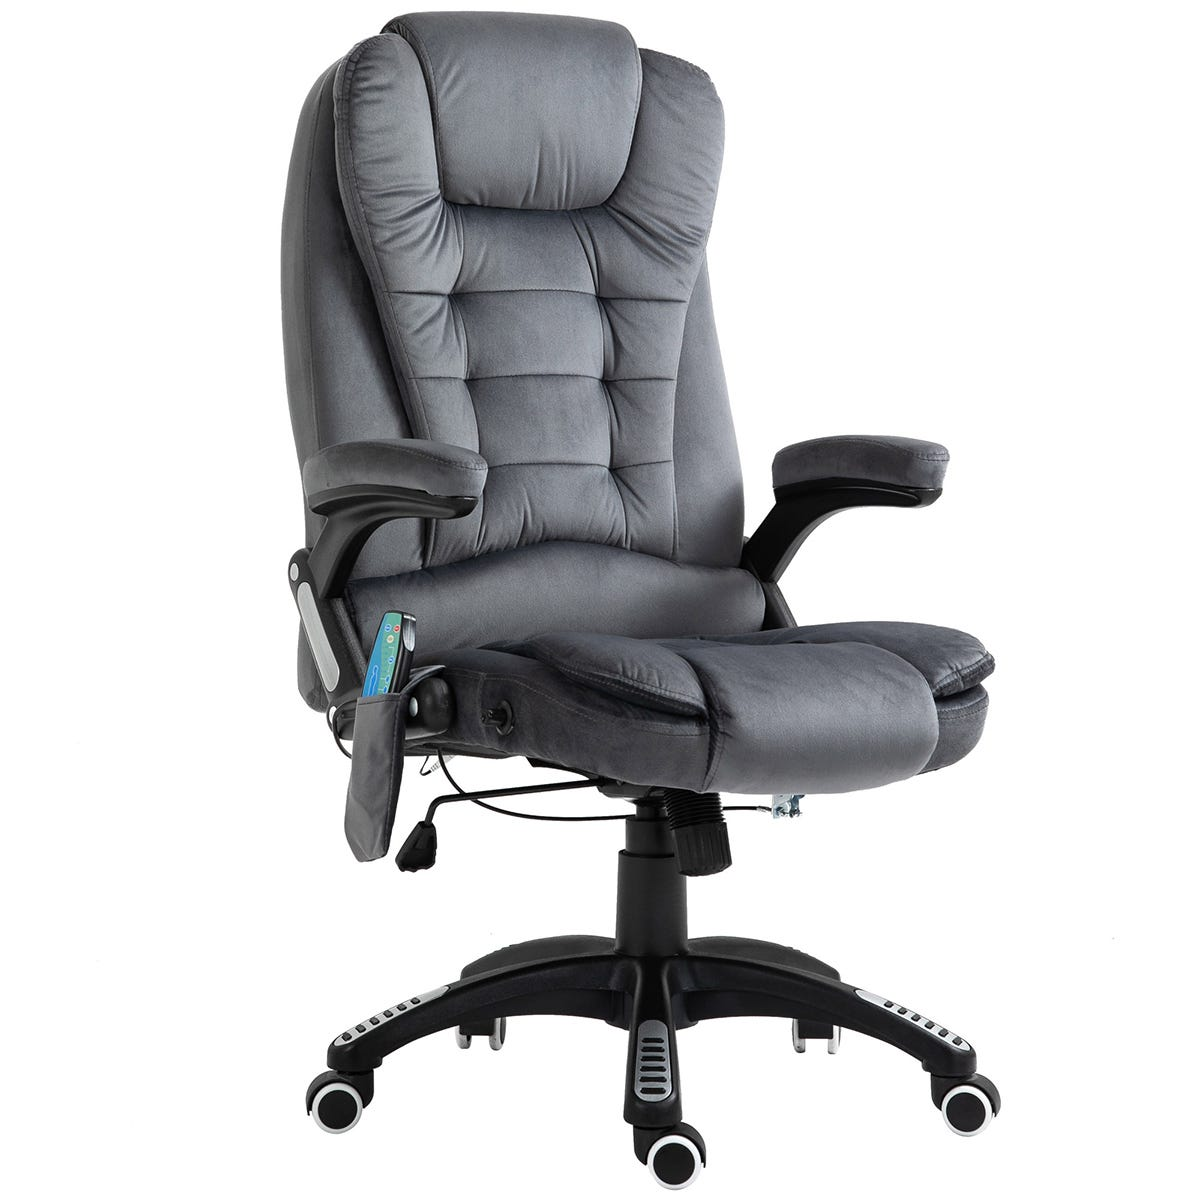 Solstice Daphne Faux Velvet Heated Massage Office Chair - Grey